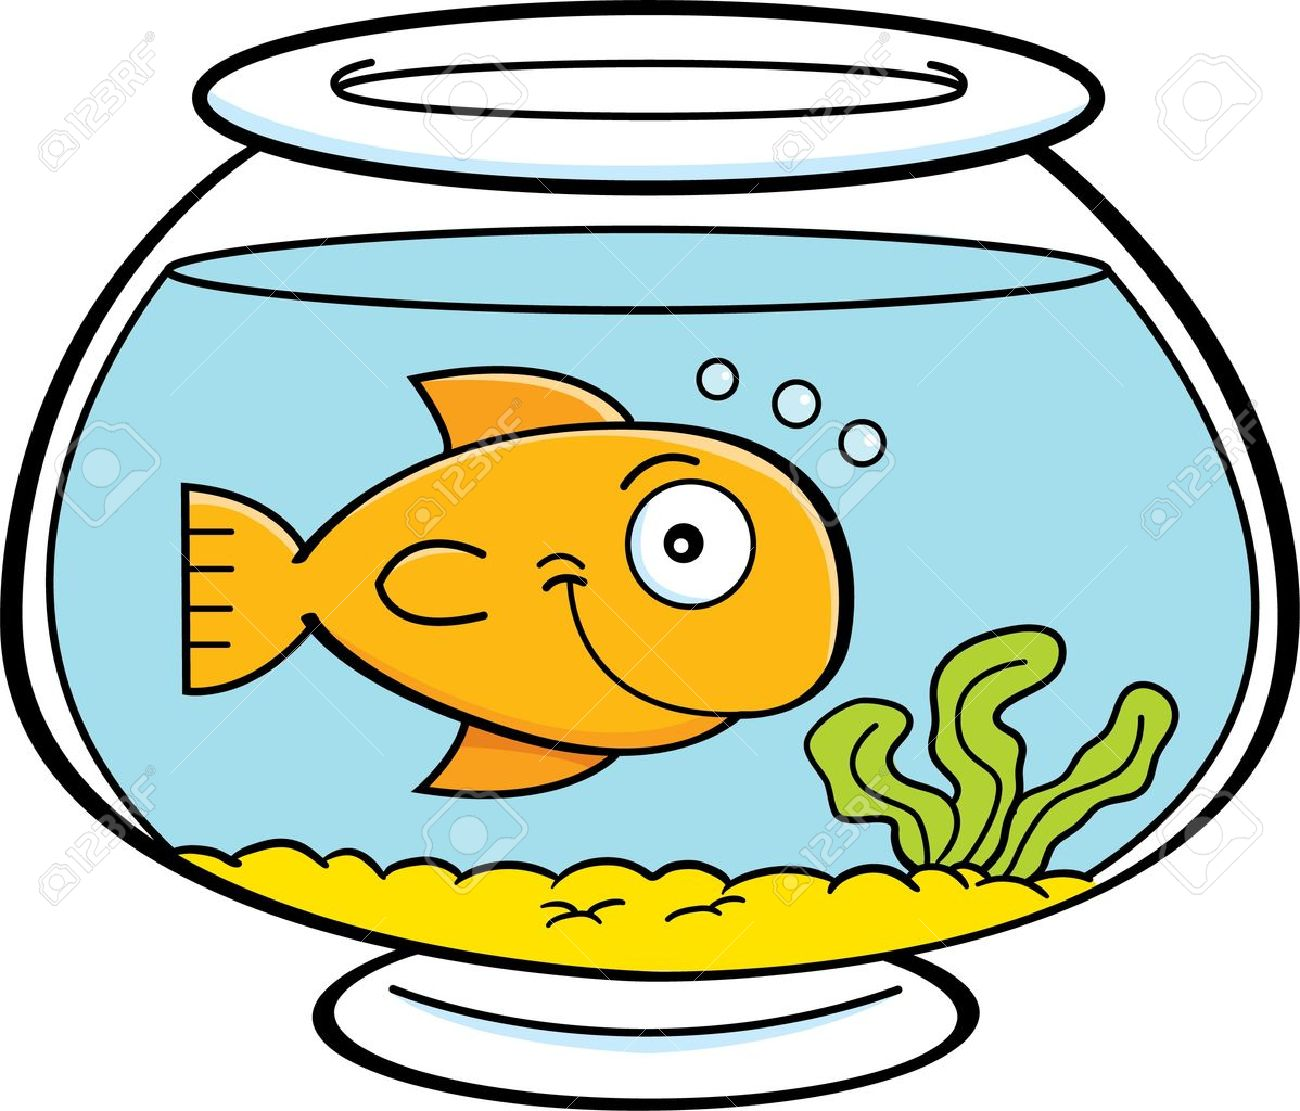 Fish tank clipart - Fish Bowl Cartoon Illustration Of A Fish In A Fish Bowl